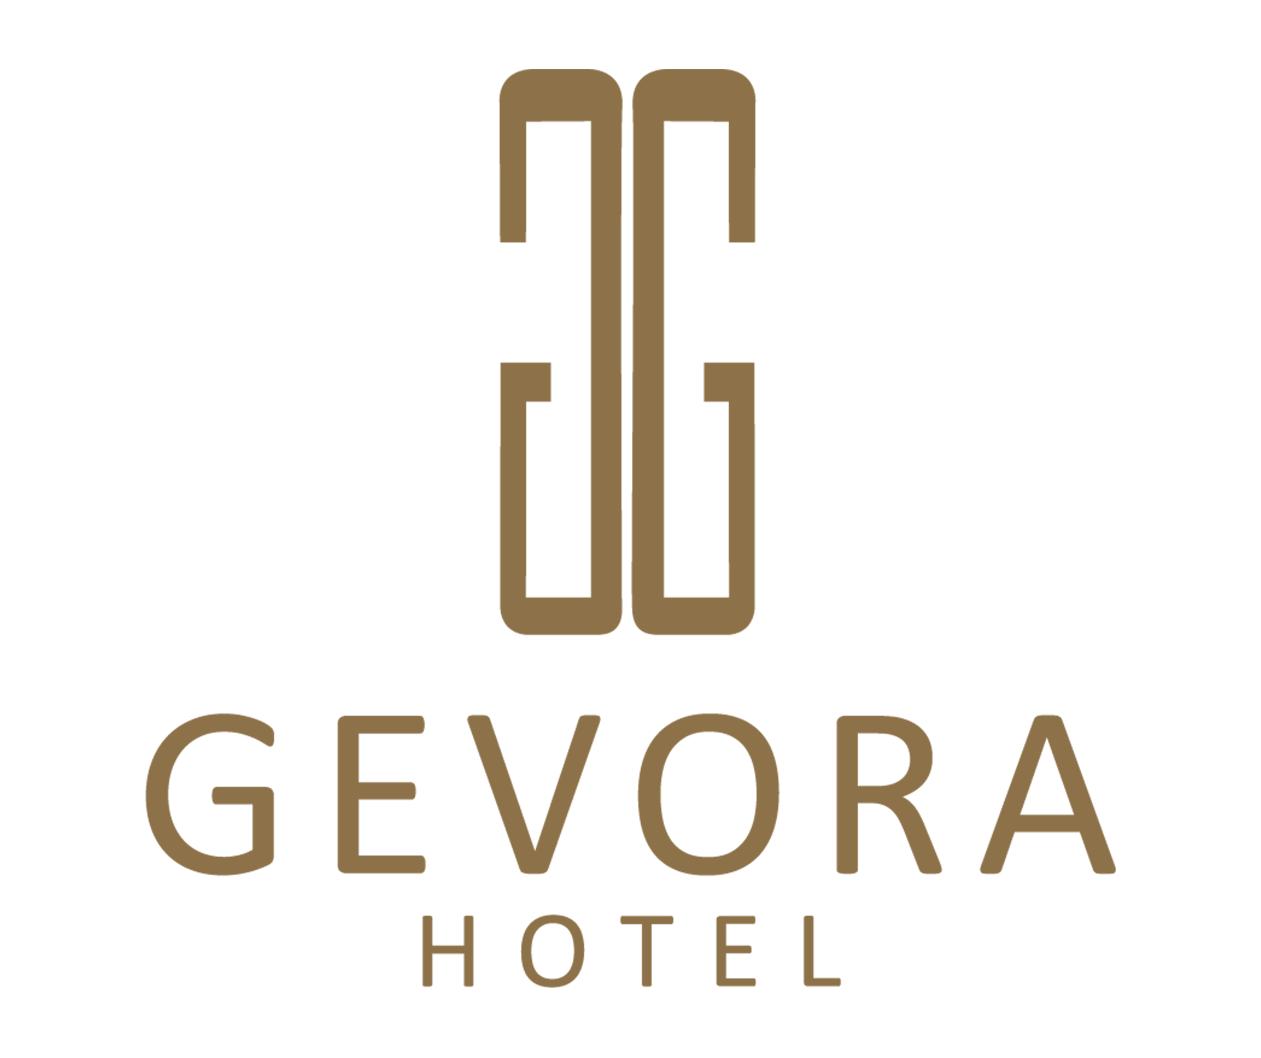 TRAX Gevora